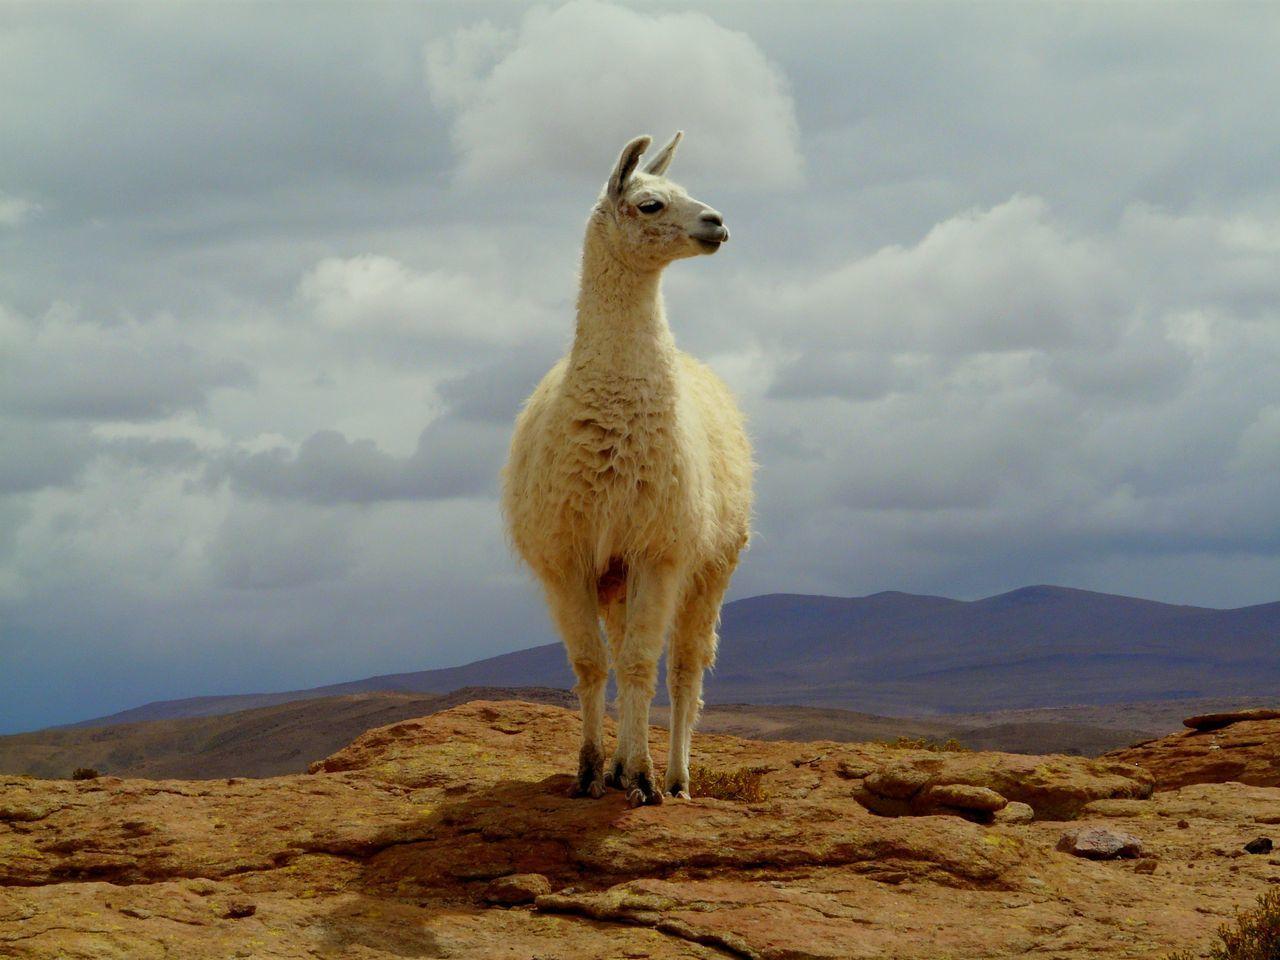 Beautiful stock photos of llama, Animal, Animal Hair, Animal Themes, Animals In The Wild